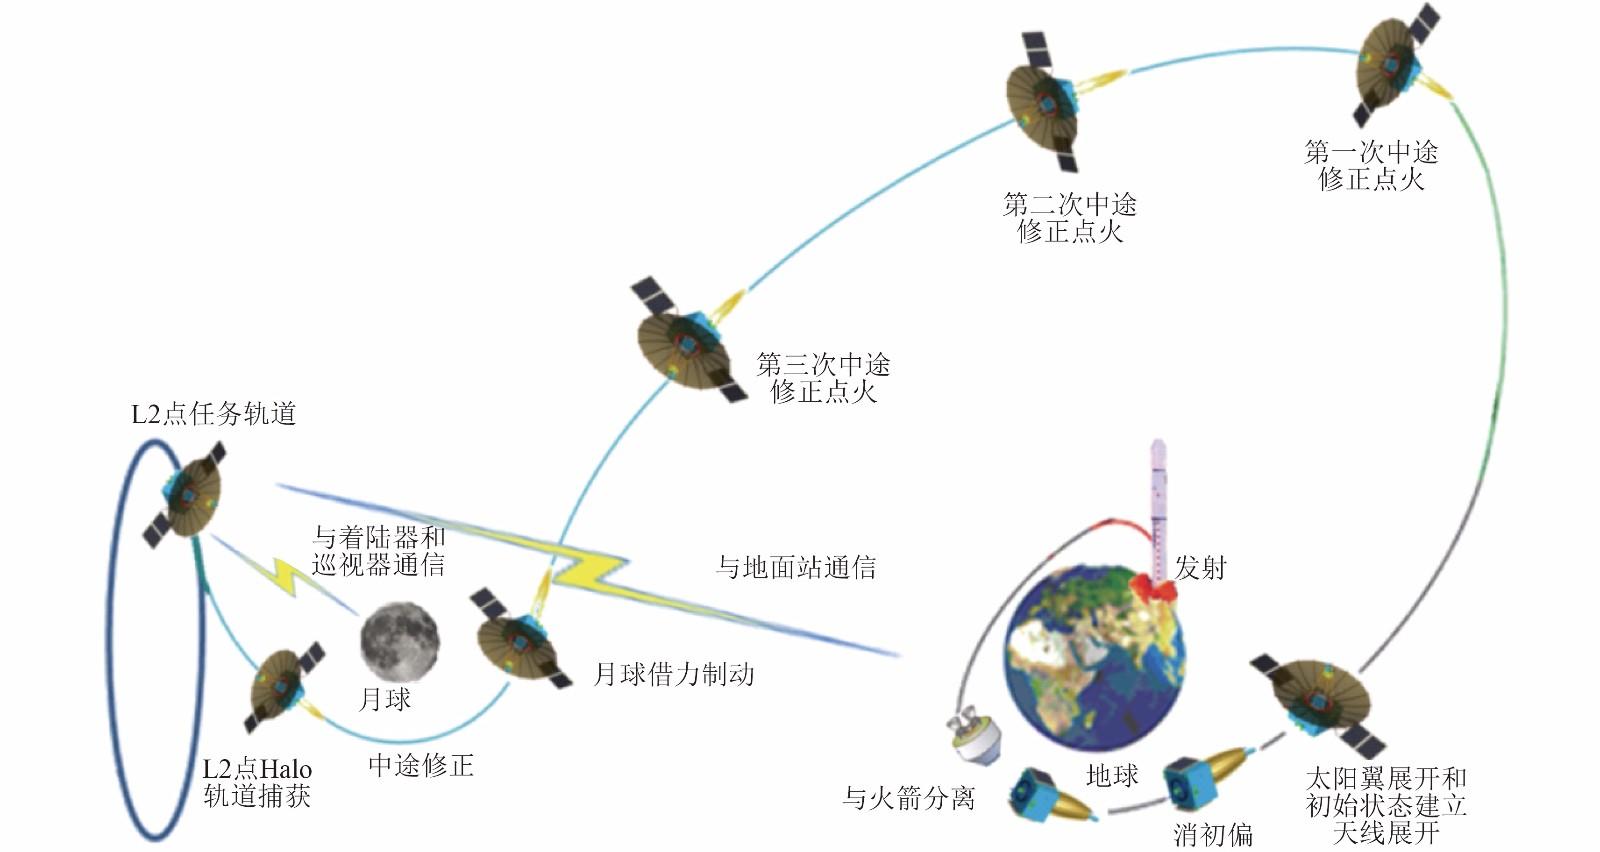 China lanza a la Luna el satélite Queqiao para retransmitir datos ...